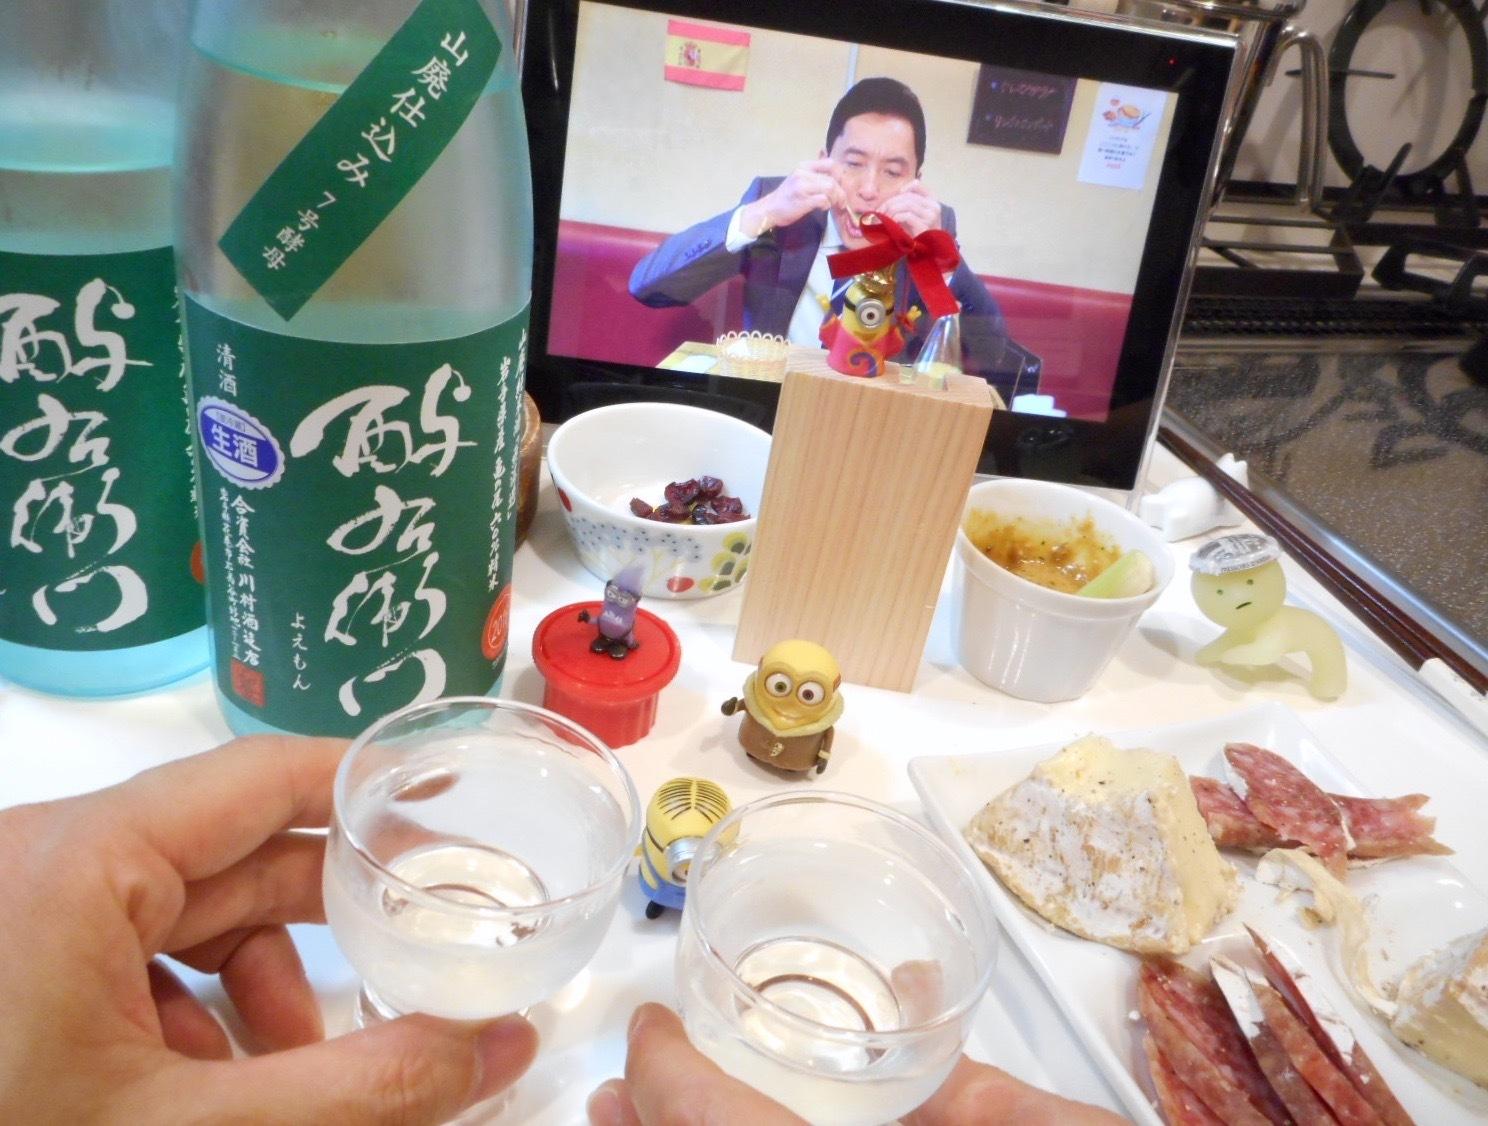 yoemon_kamenoo_yamahai28by3.jpg